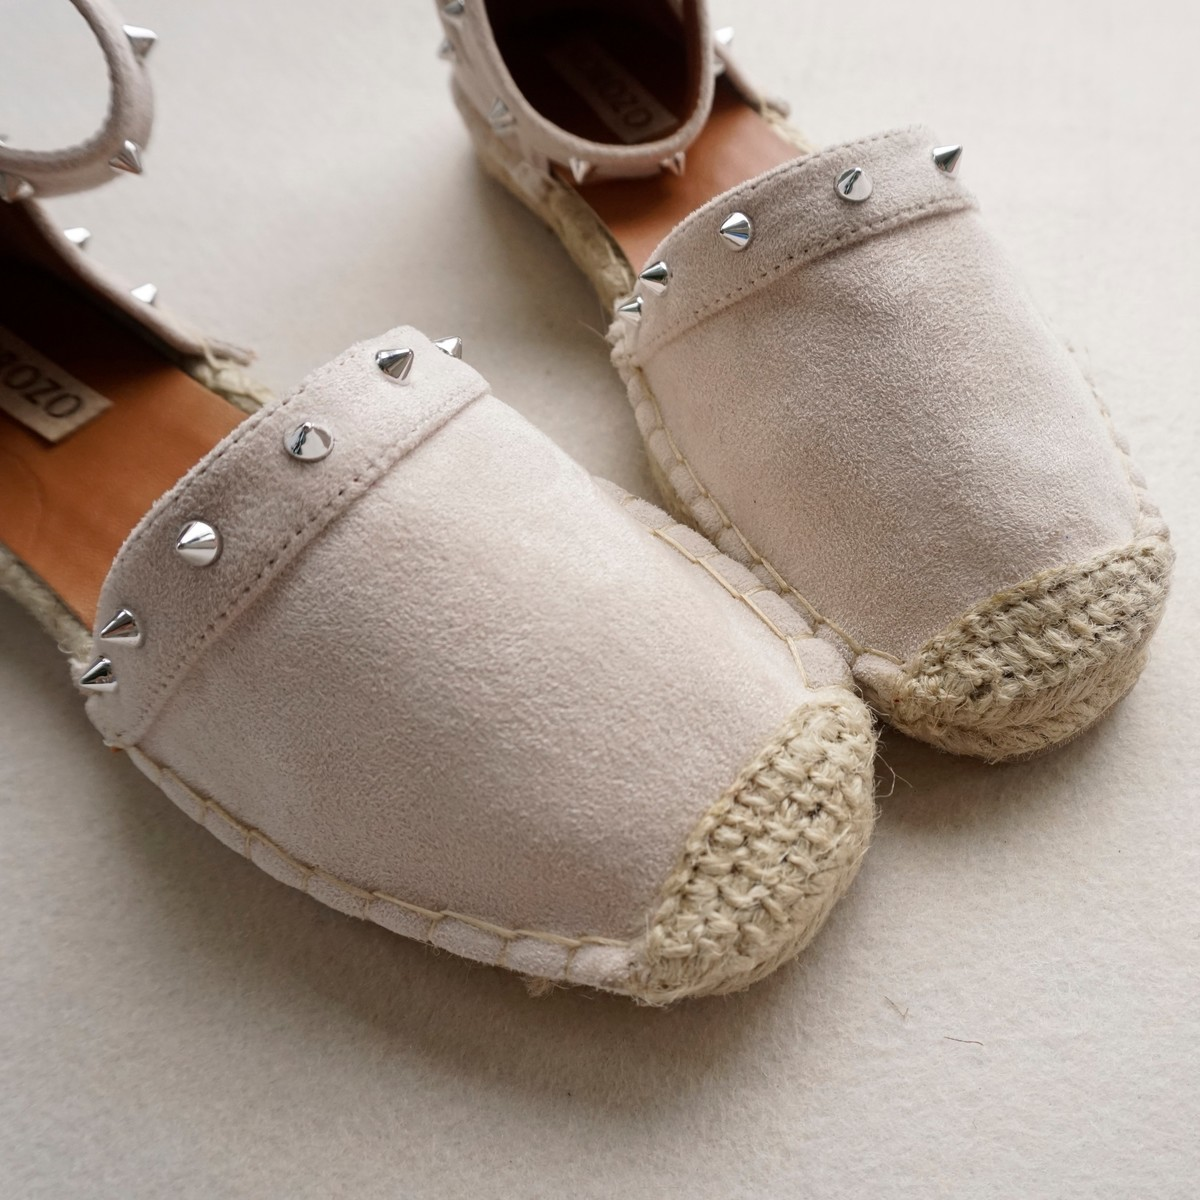 Flat heel sandals images - Aliexpress Com Buy Women Hemp Suede Metal Rivets Fisherman Shoes Ladies Slipony Buckle Espadrilles Velvet Flat Heel Sandals Stud Gladiator Loafers From